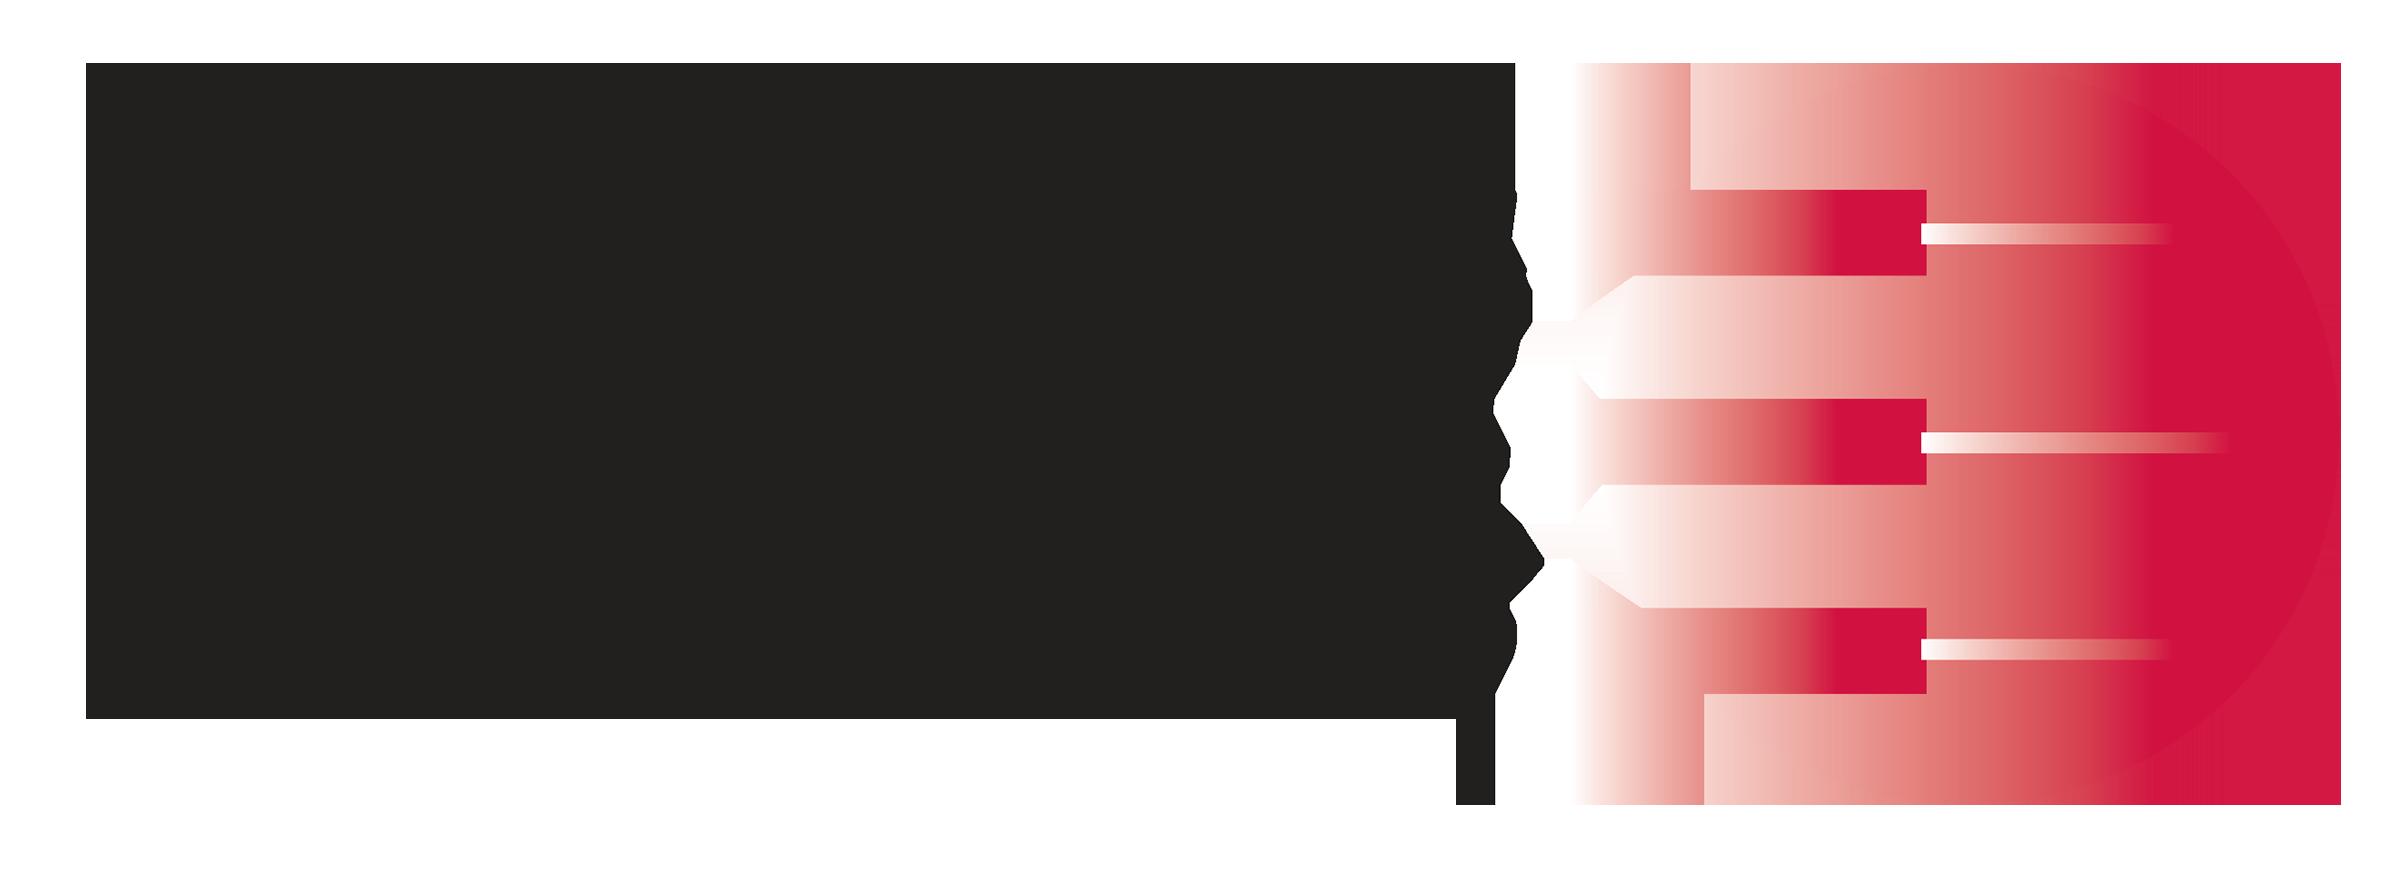 Cal Test Electronics logo